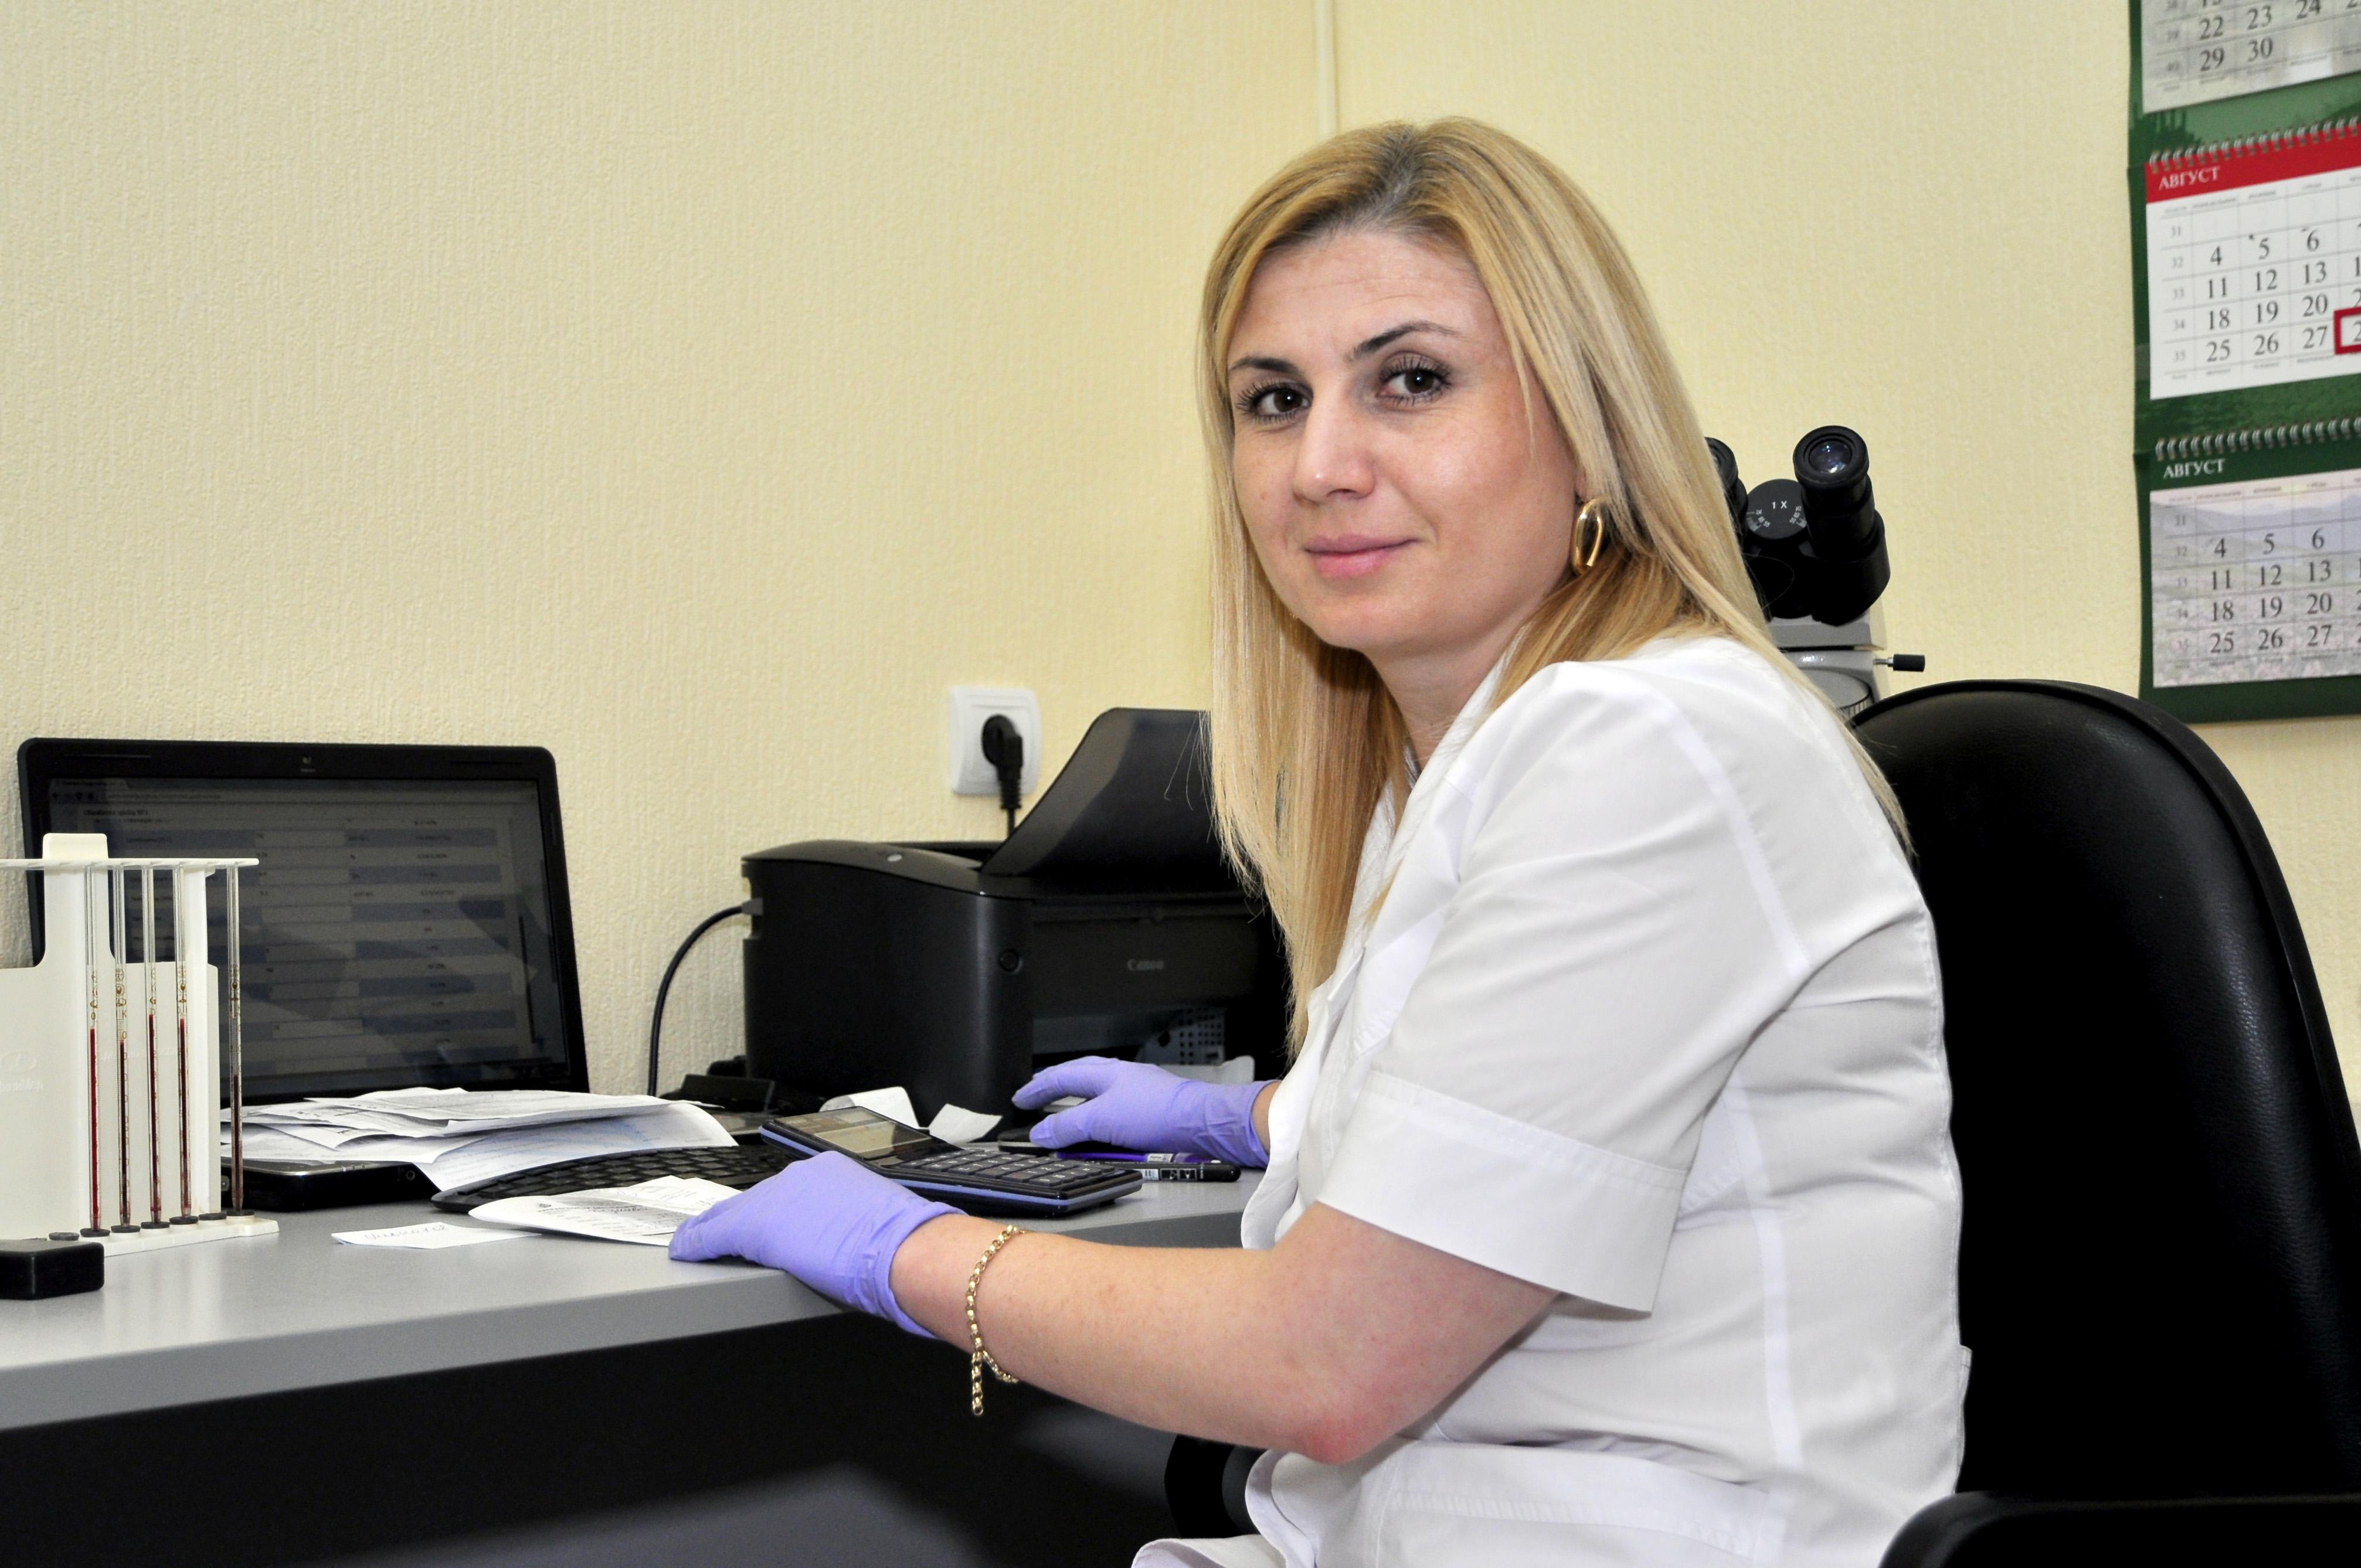 Алакаева Марьяна Магомедовна